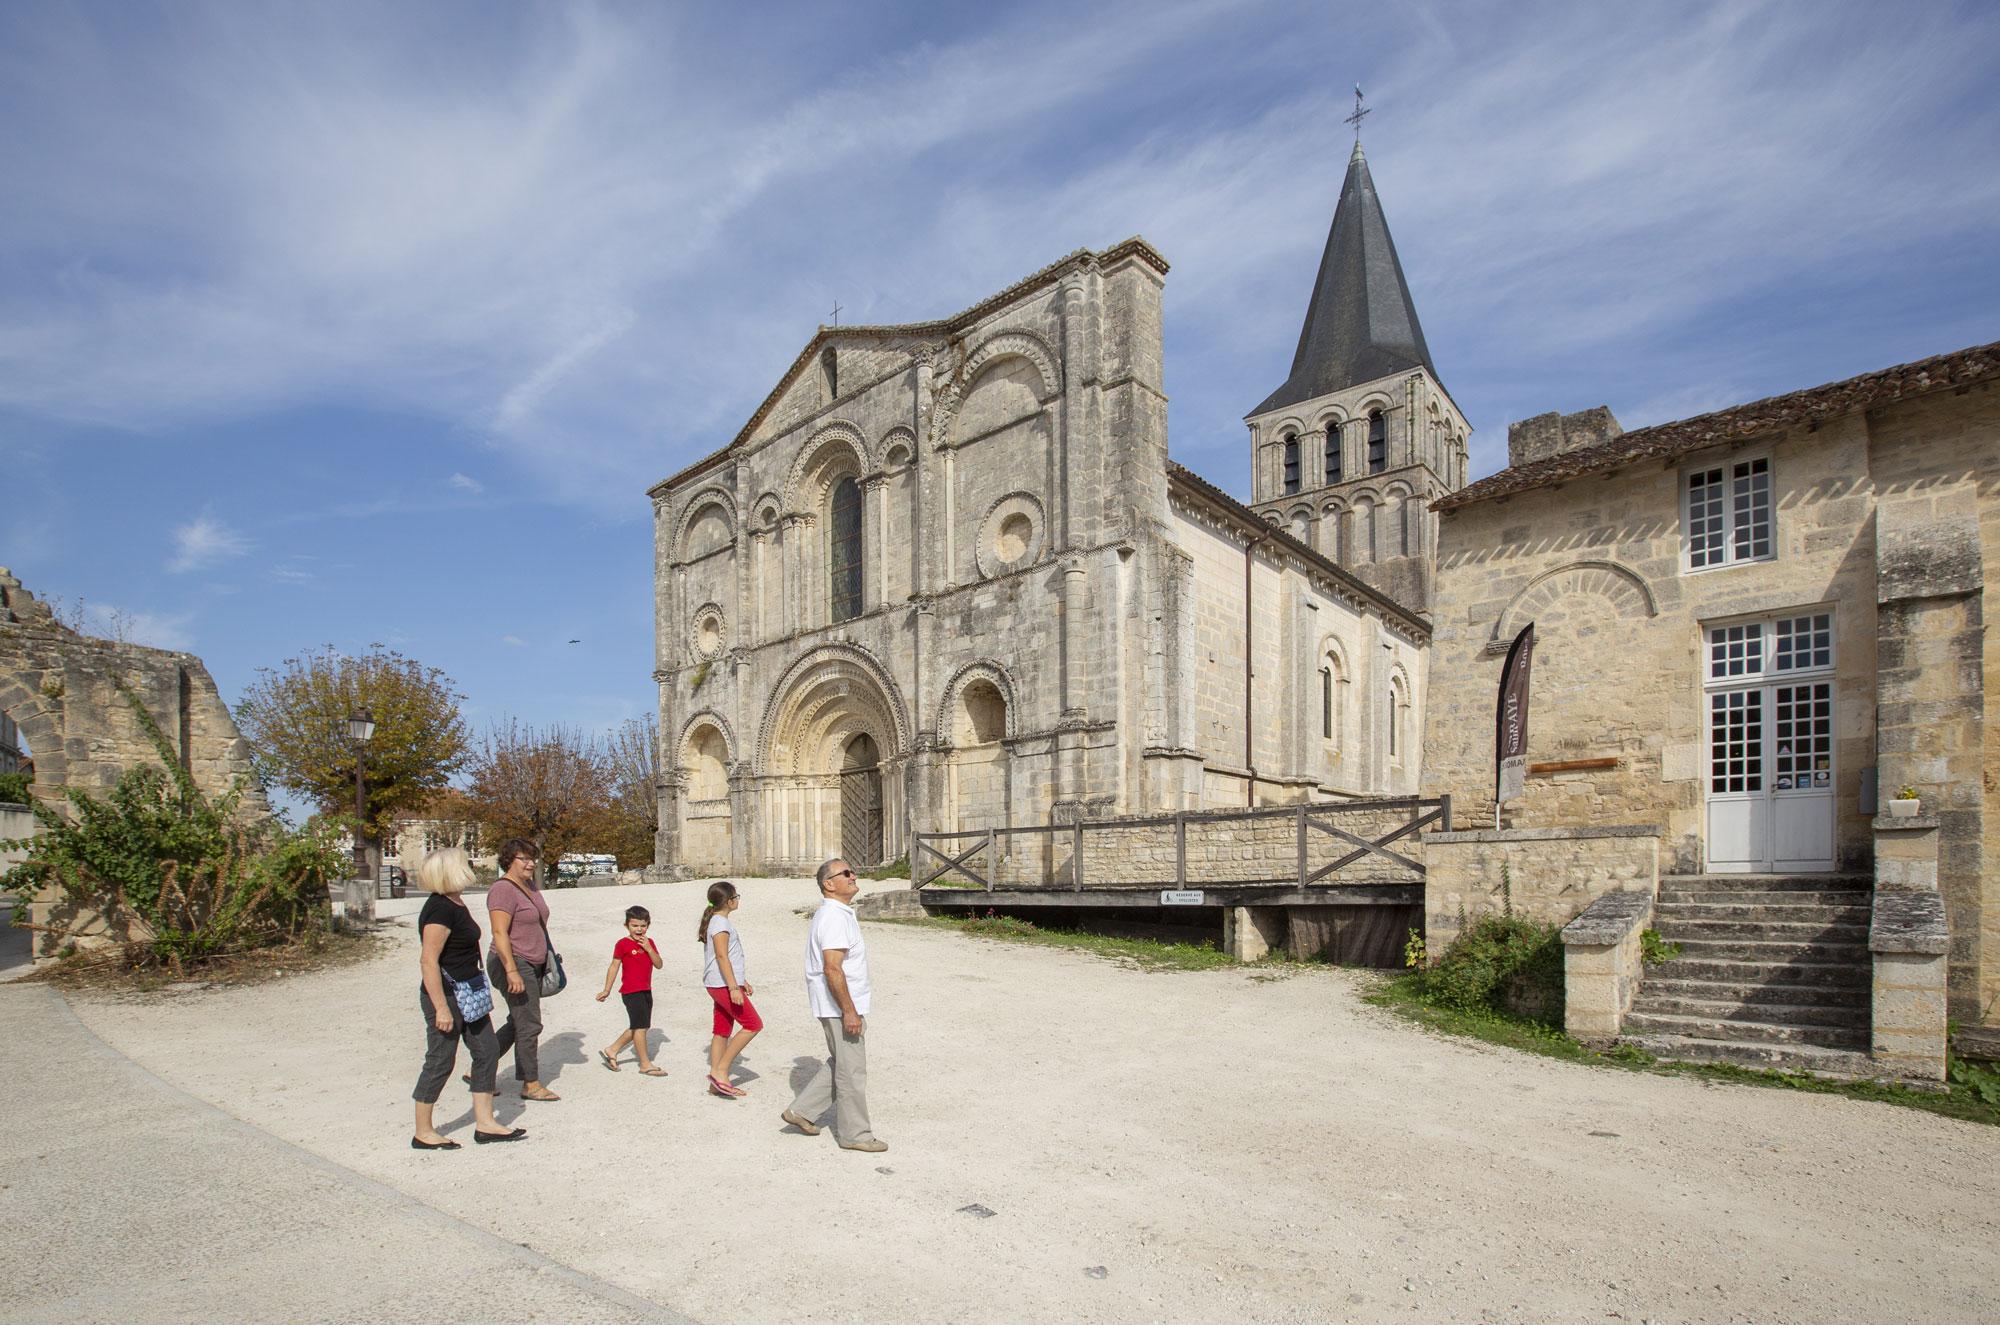 abbaye Saint-Amant-de-Boixe